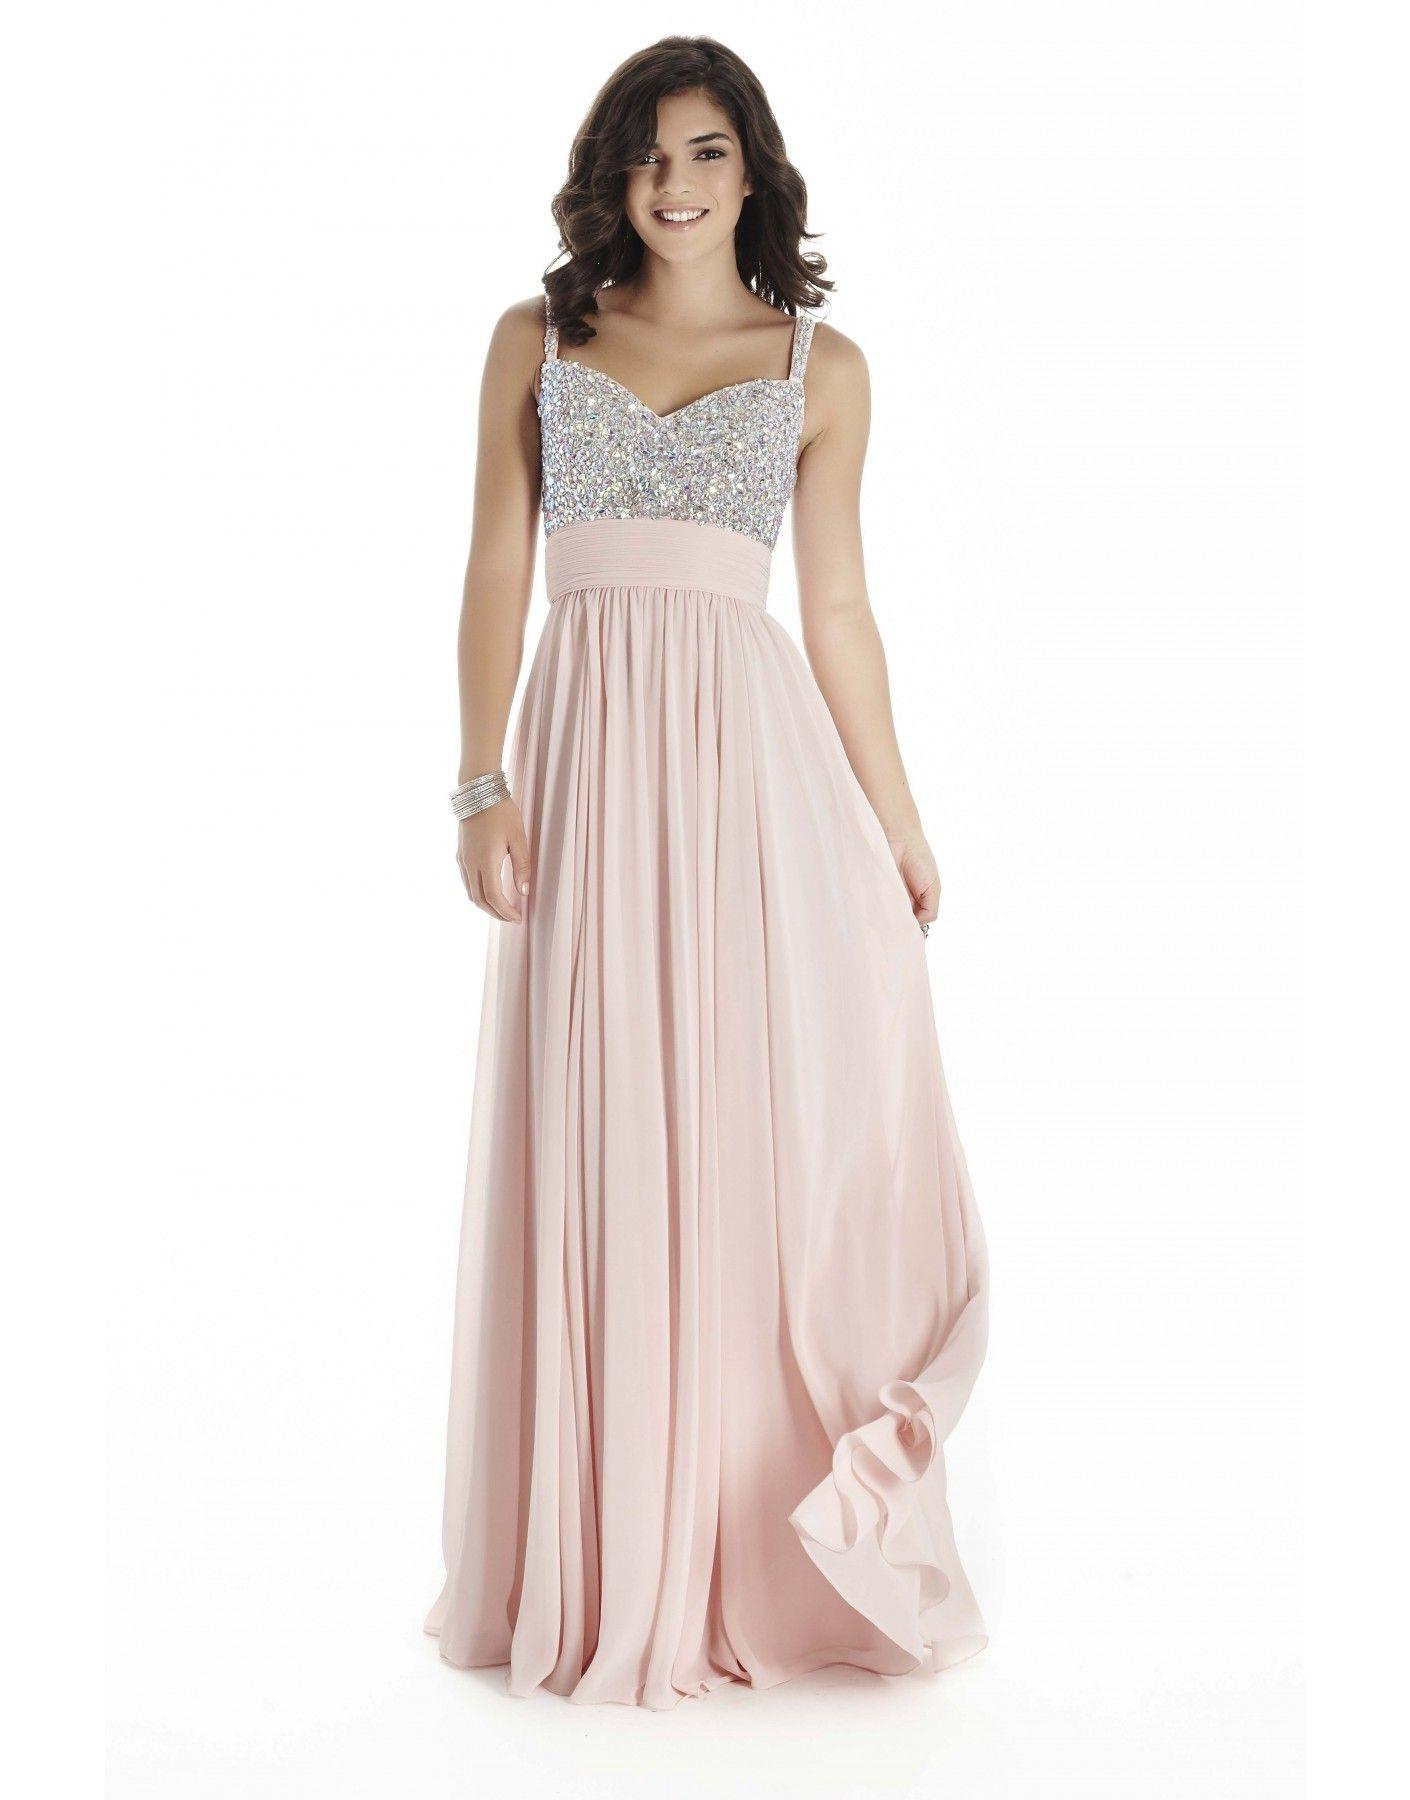 cb947b98995c Best Prom Dress Shops In Charlotte Nc - raveitsafe